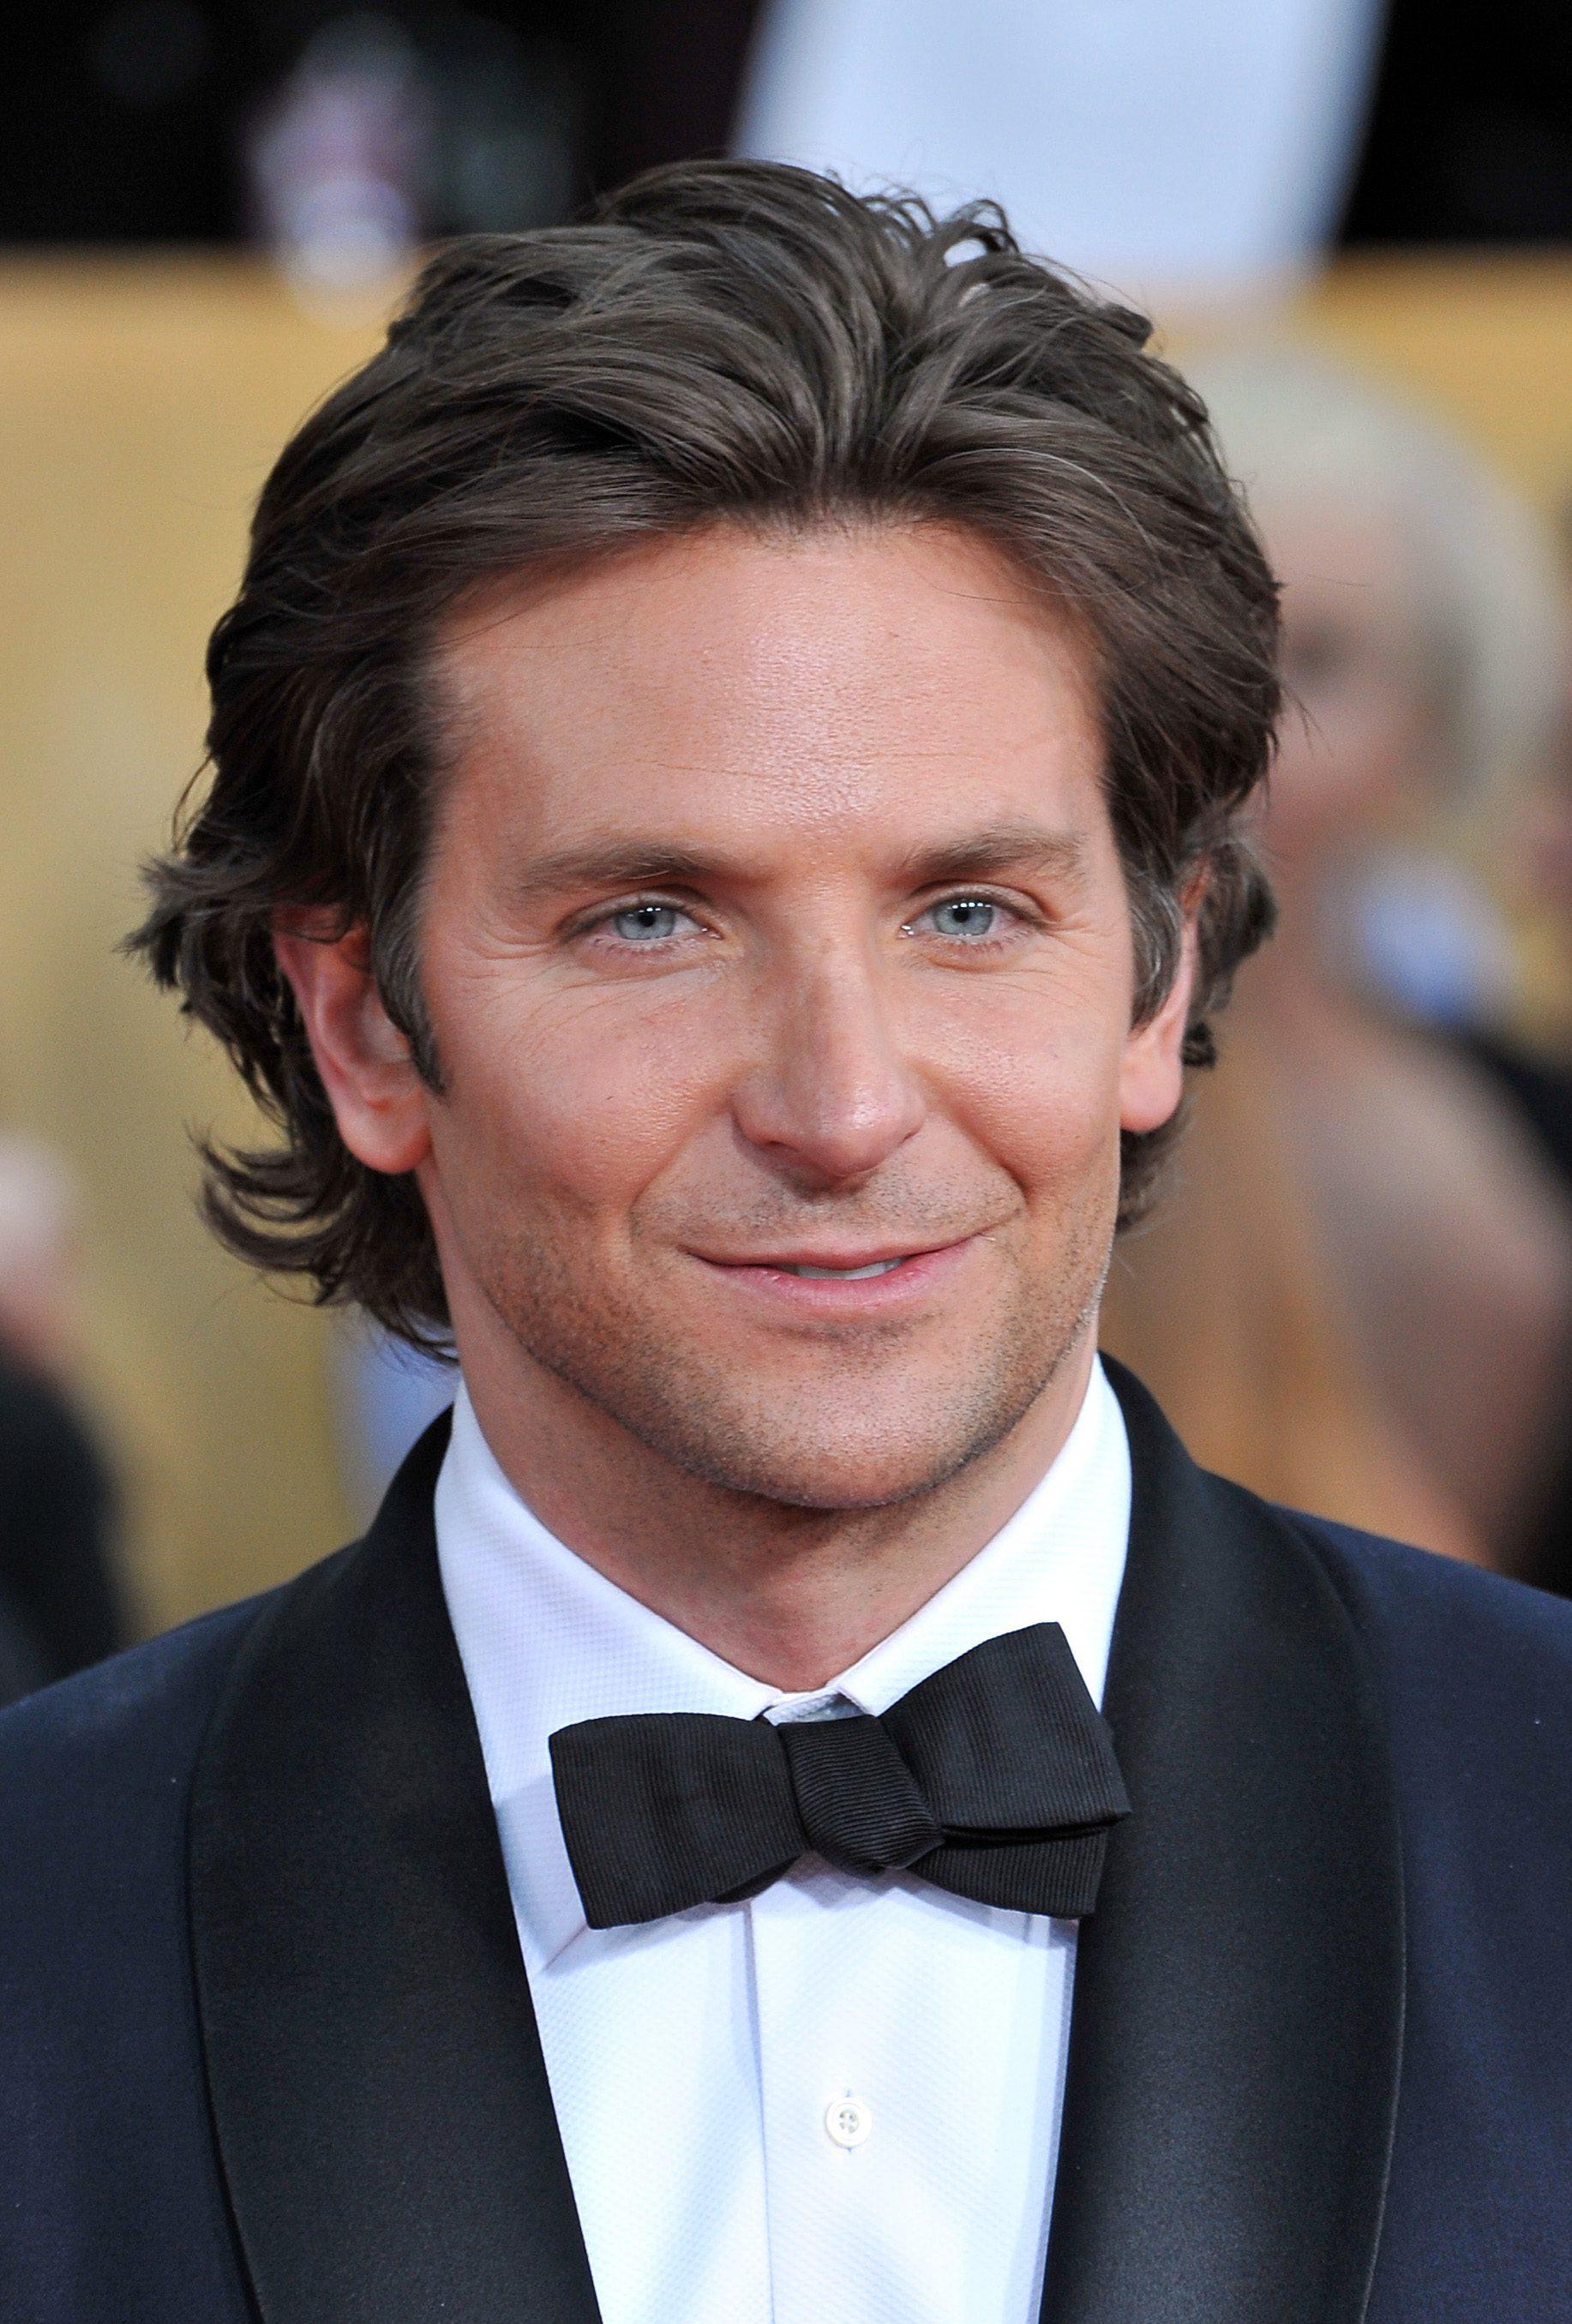 Bradley Cooper's Flow Hairstyle